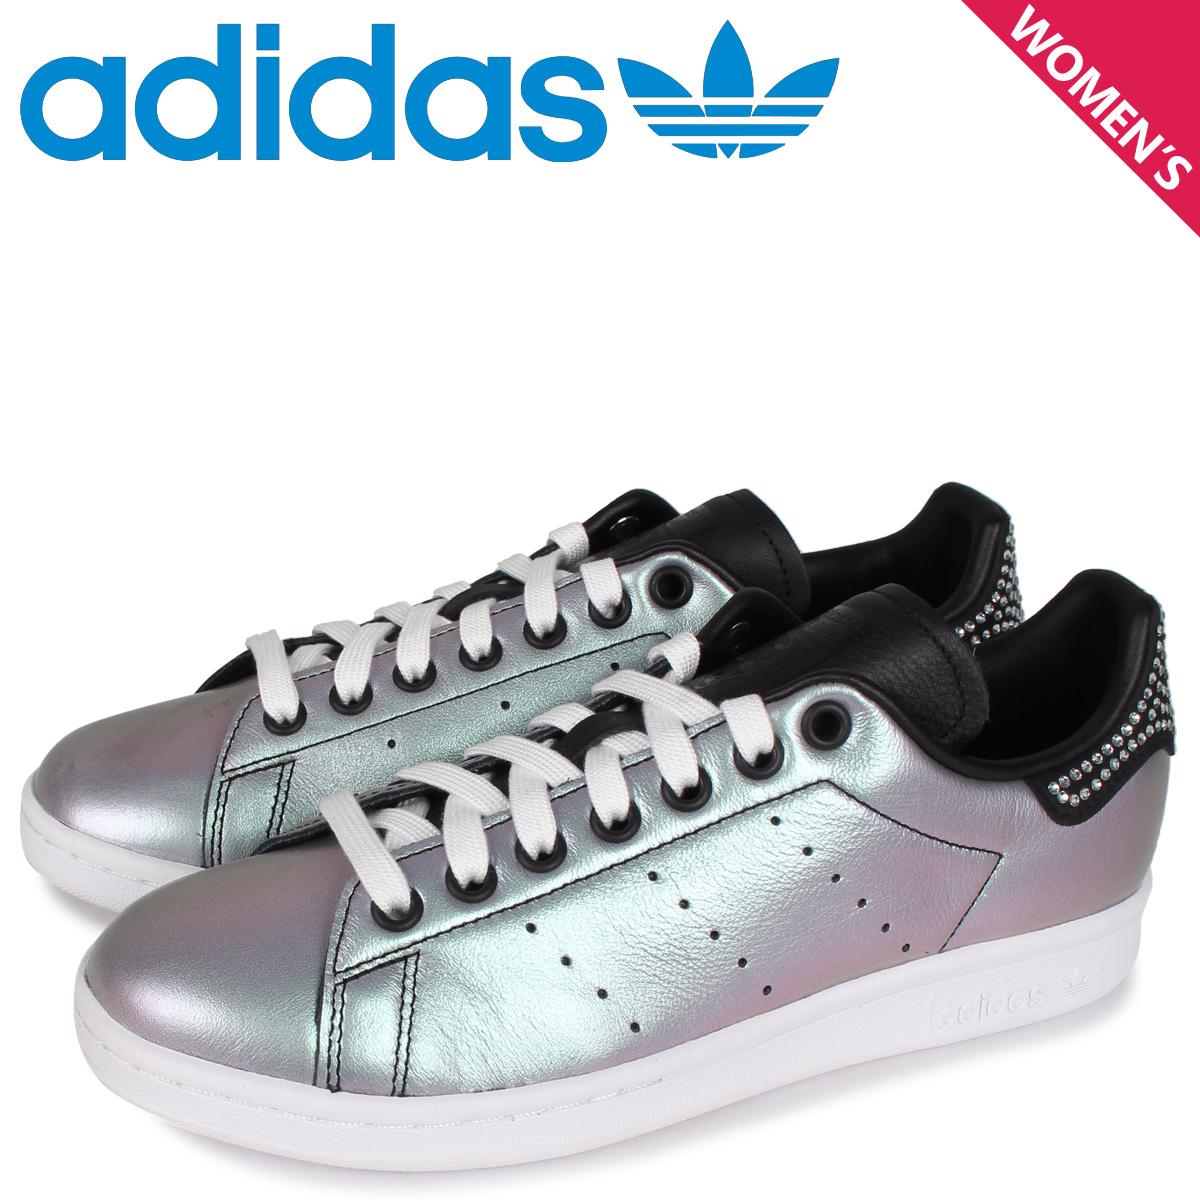 adidas Originals アディダス オリジナルス スタンスミス スニーカー レディース STAN SMITH W ブラック 黒 FV3423 [4/27 新入荷]